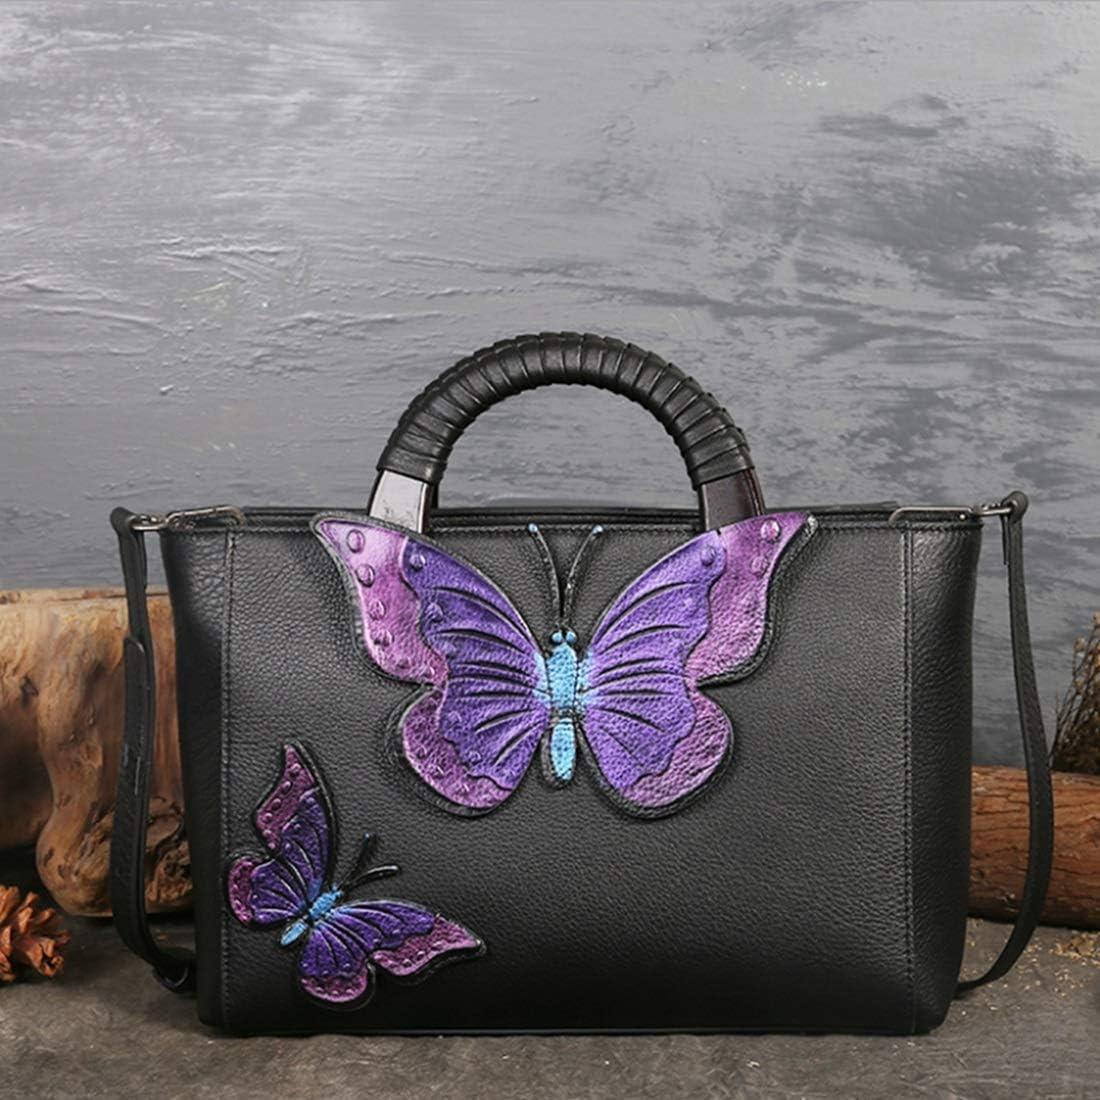 Somnrchun Borsa a Tracolla in Pelle Stile Etnico for Signora (Colore : Blue Butterfly) Purple Butterfly